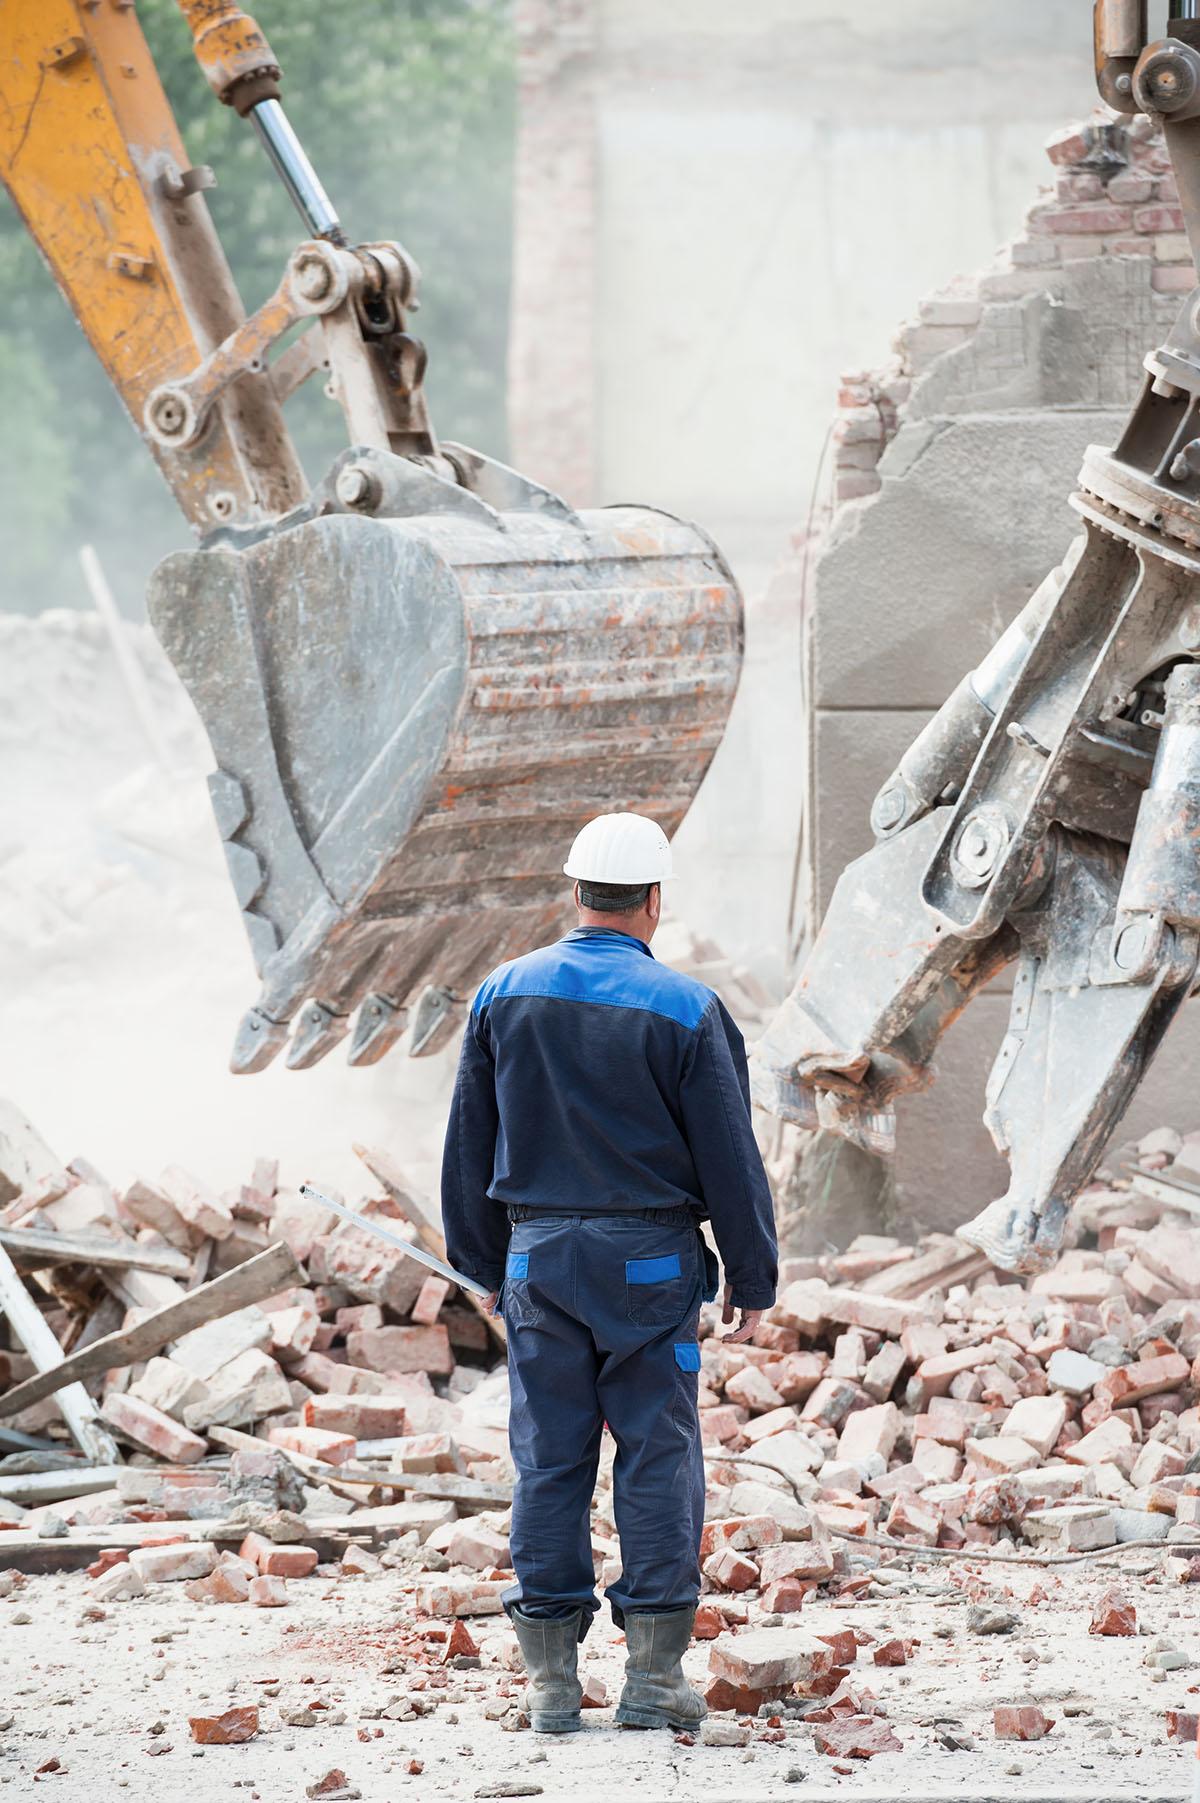 Excavator, man at building demolition site